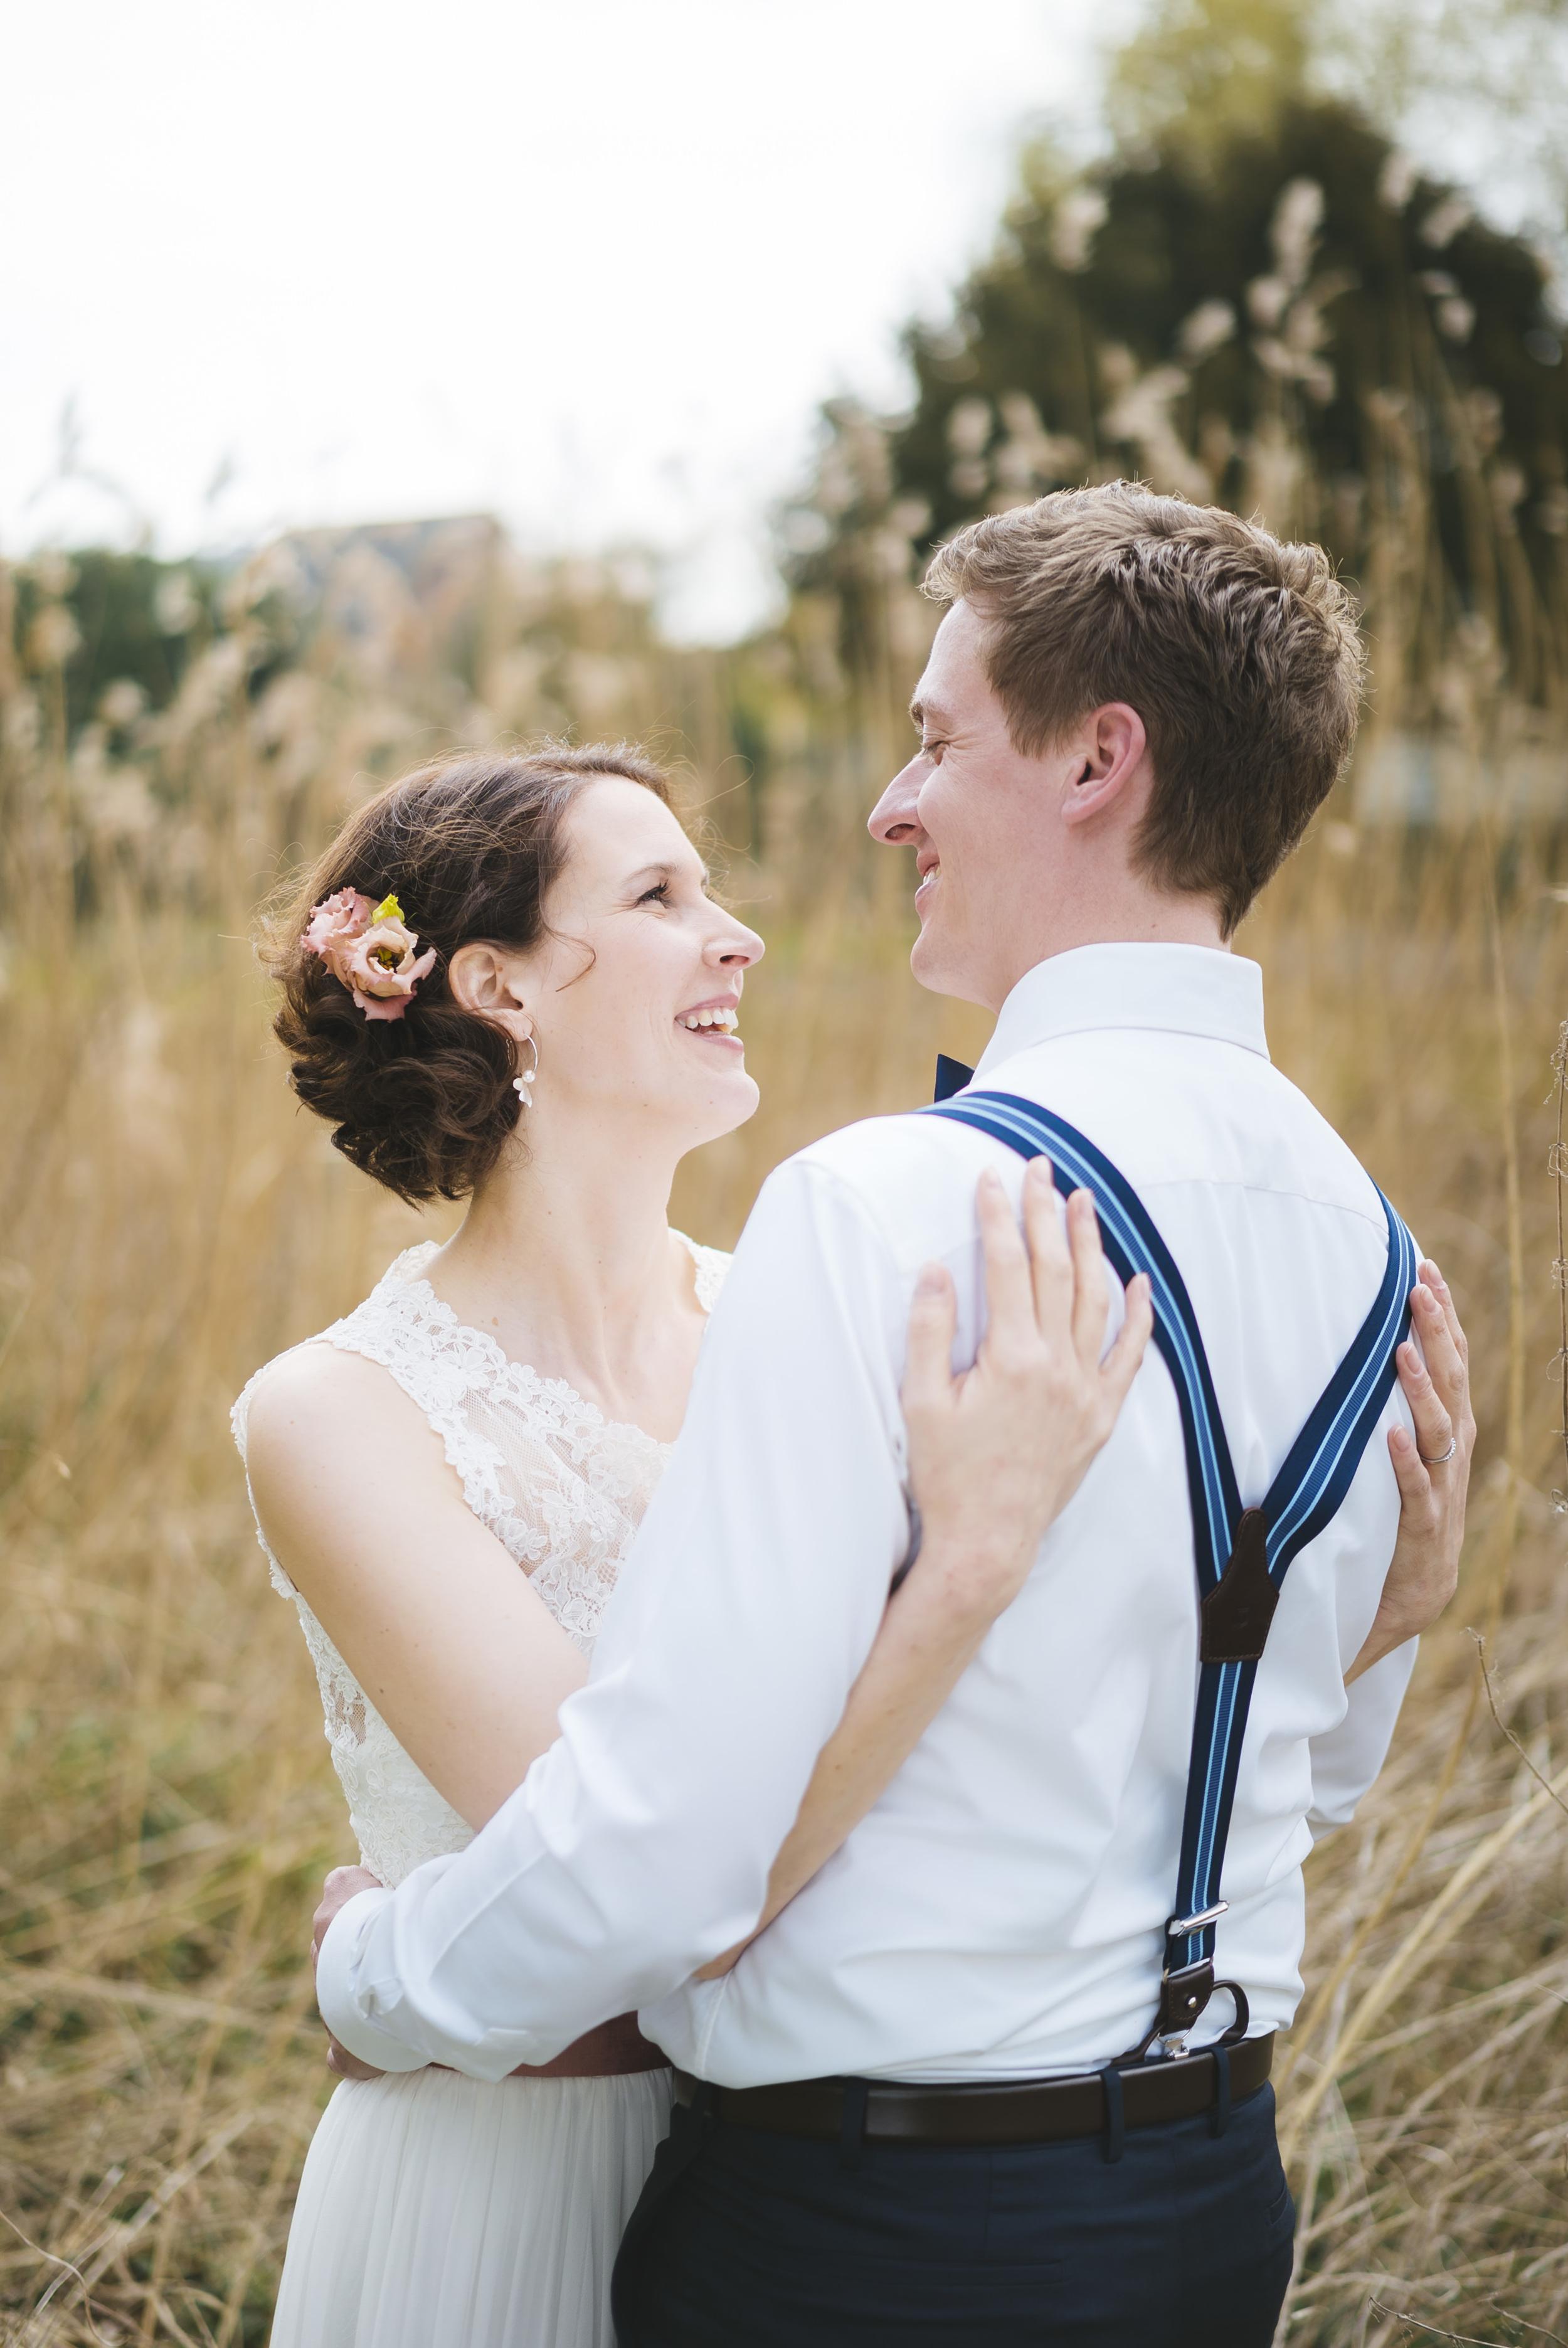 Hochzeitsfotograf-Schlossruine-Hertefeld-Weeze-028.jpg